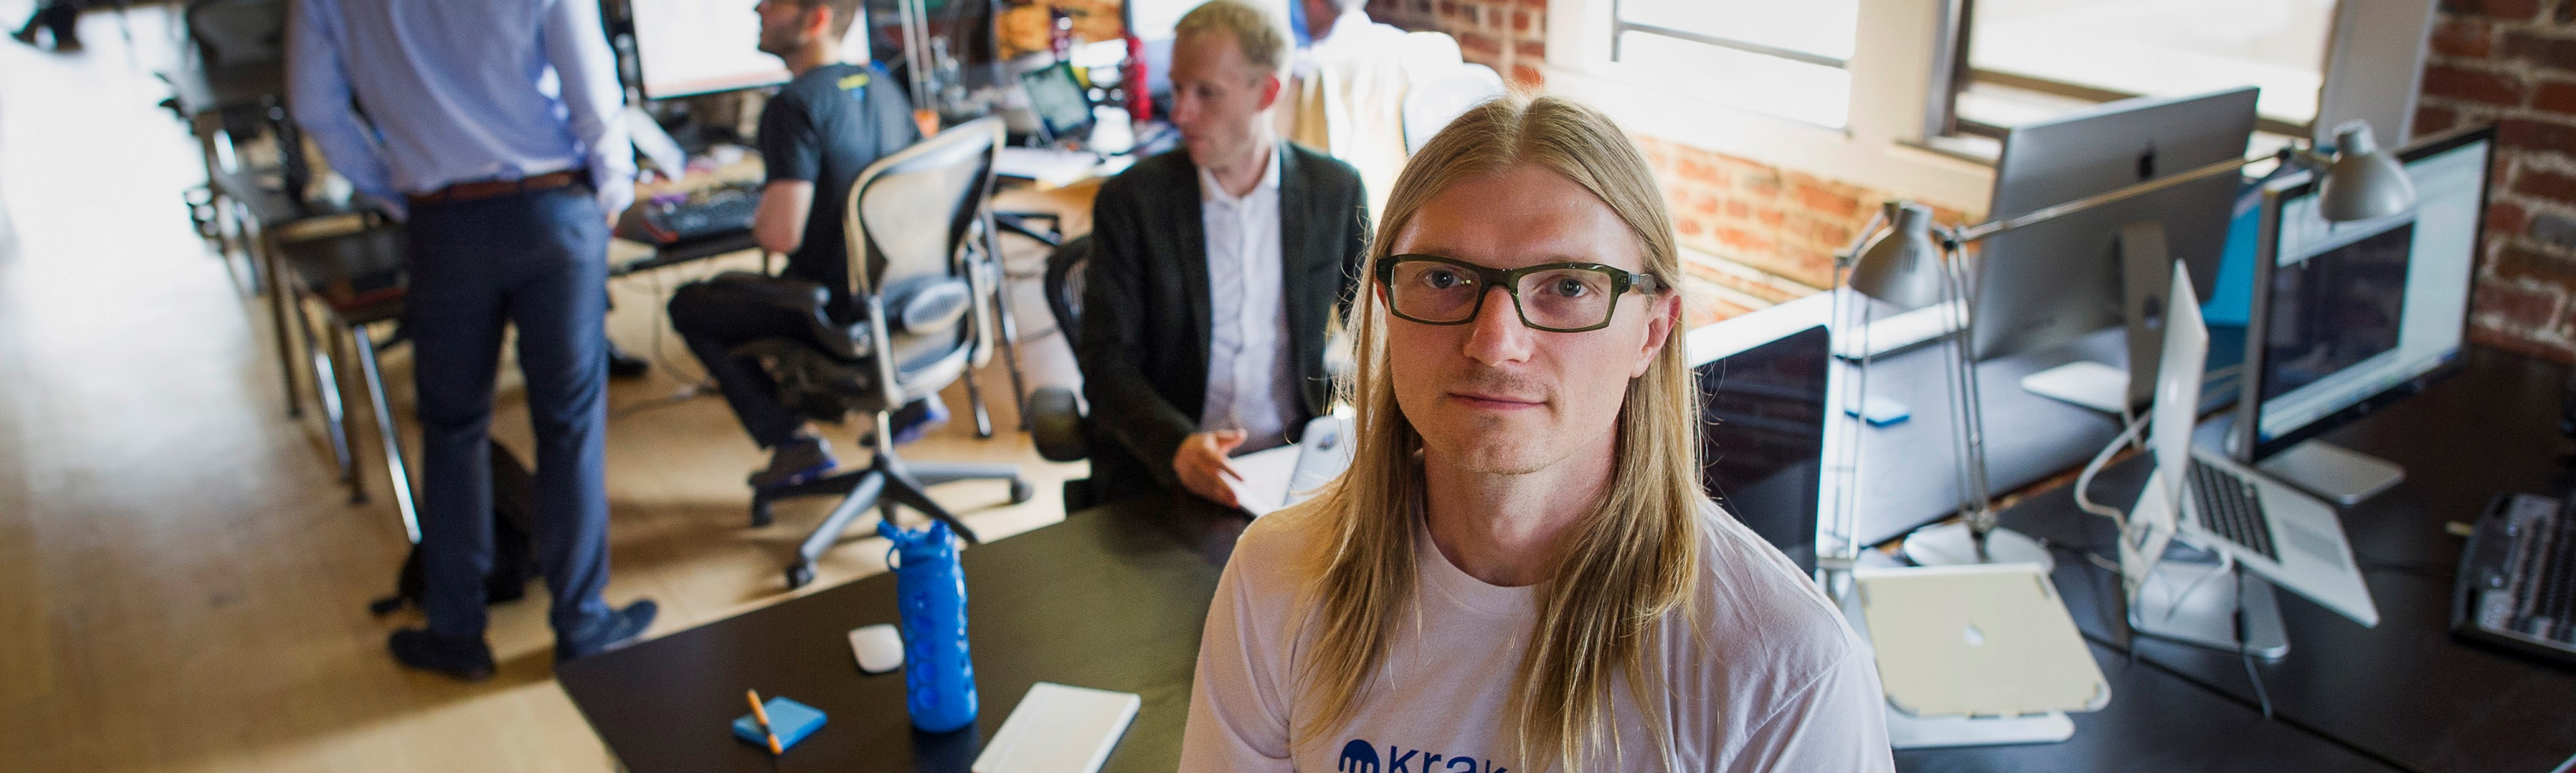 Биржа Kraken объявила о запуске своей ноды Chainlink